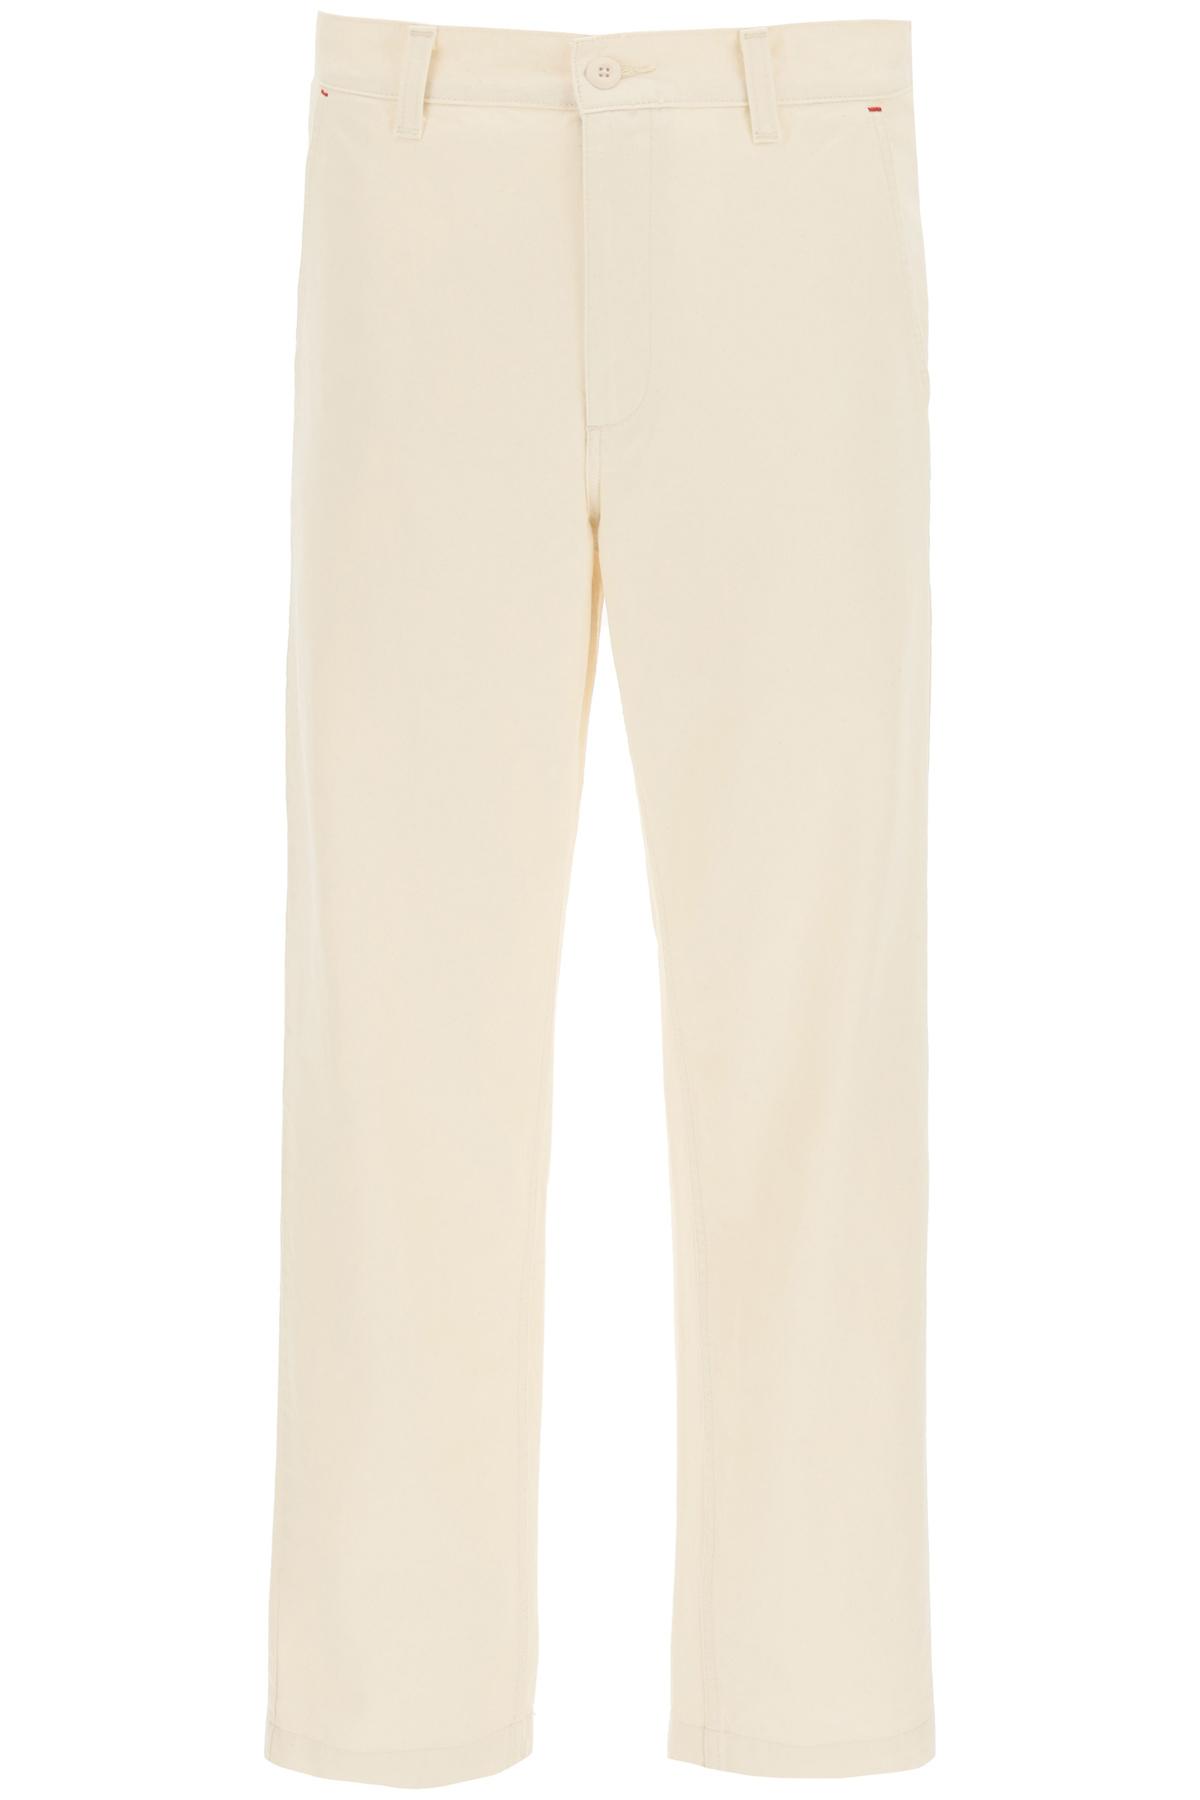 Carhartt pantaloni wesley in cotone